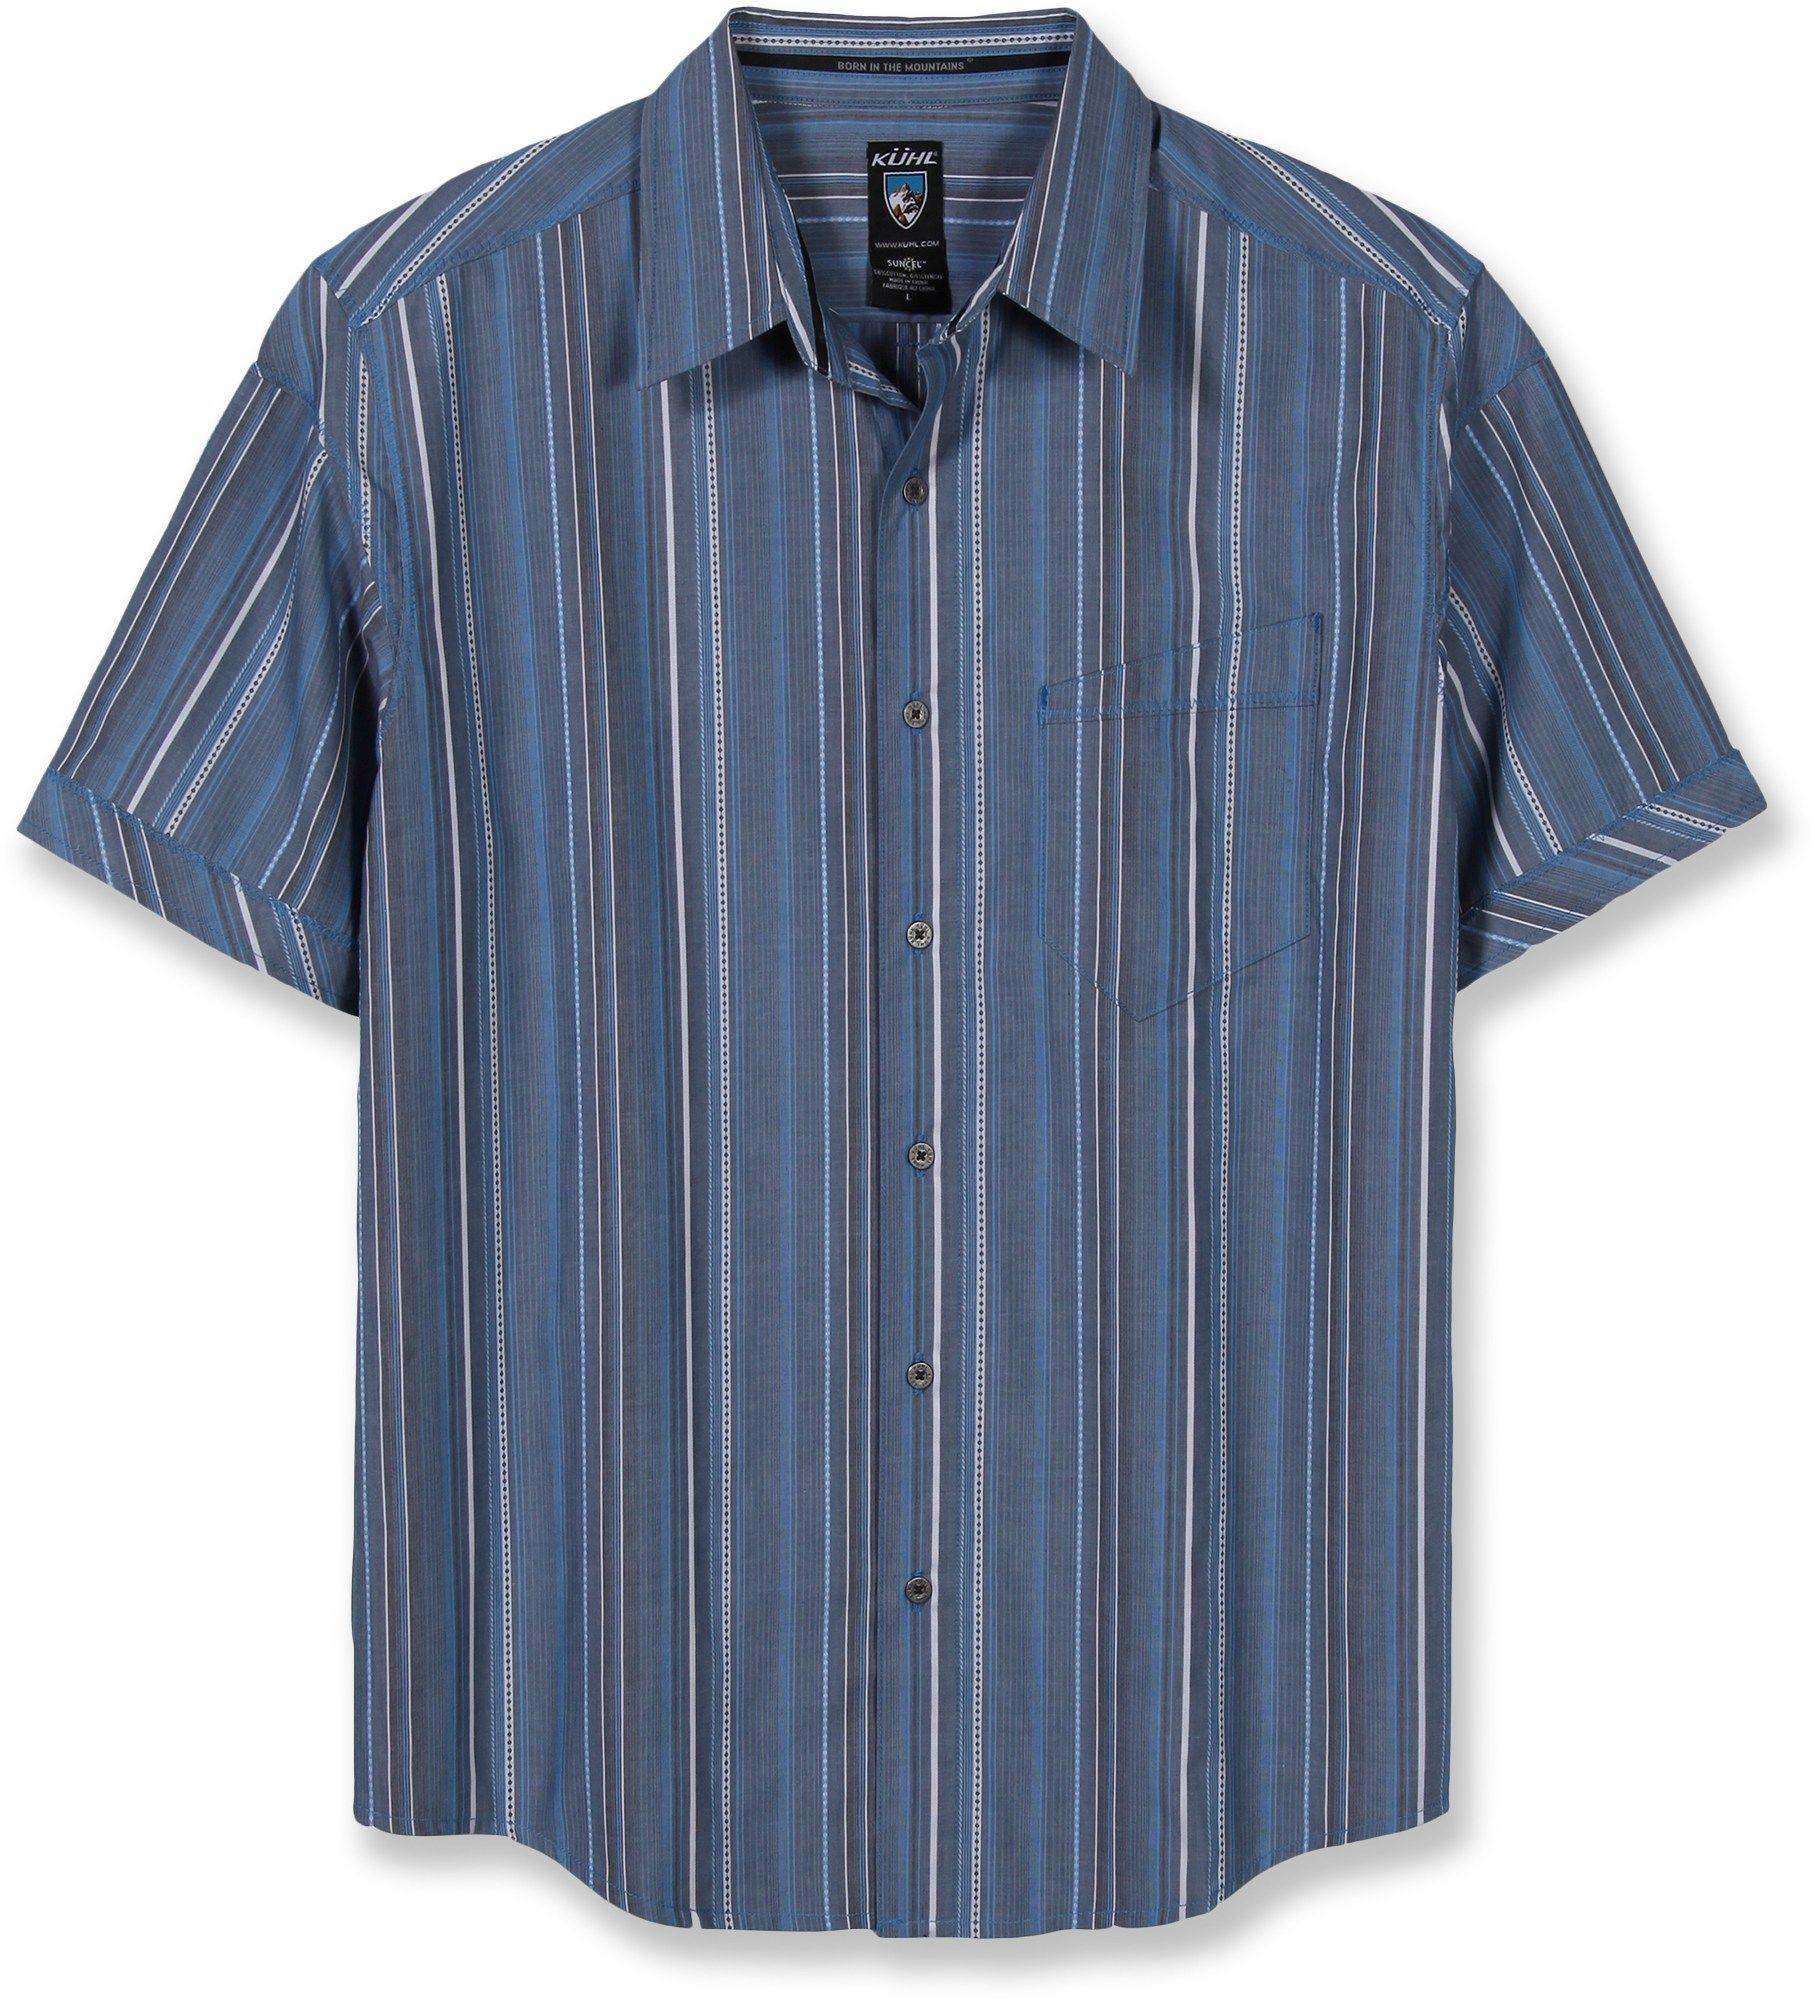 Kuhl Male Vertikl Shirt - Men's